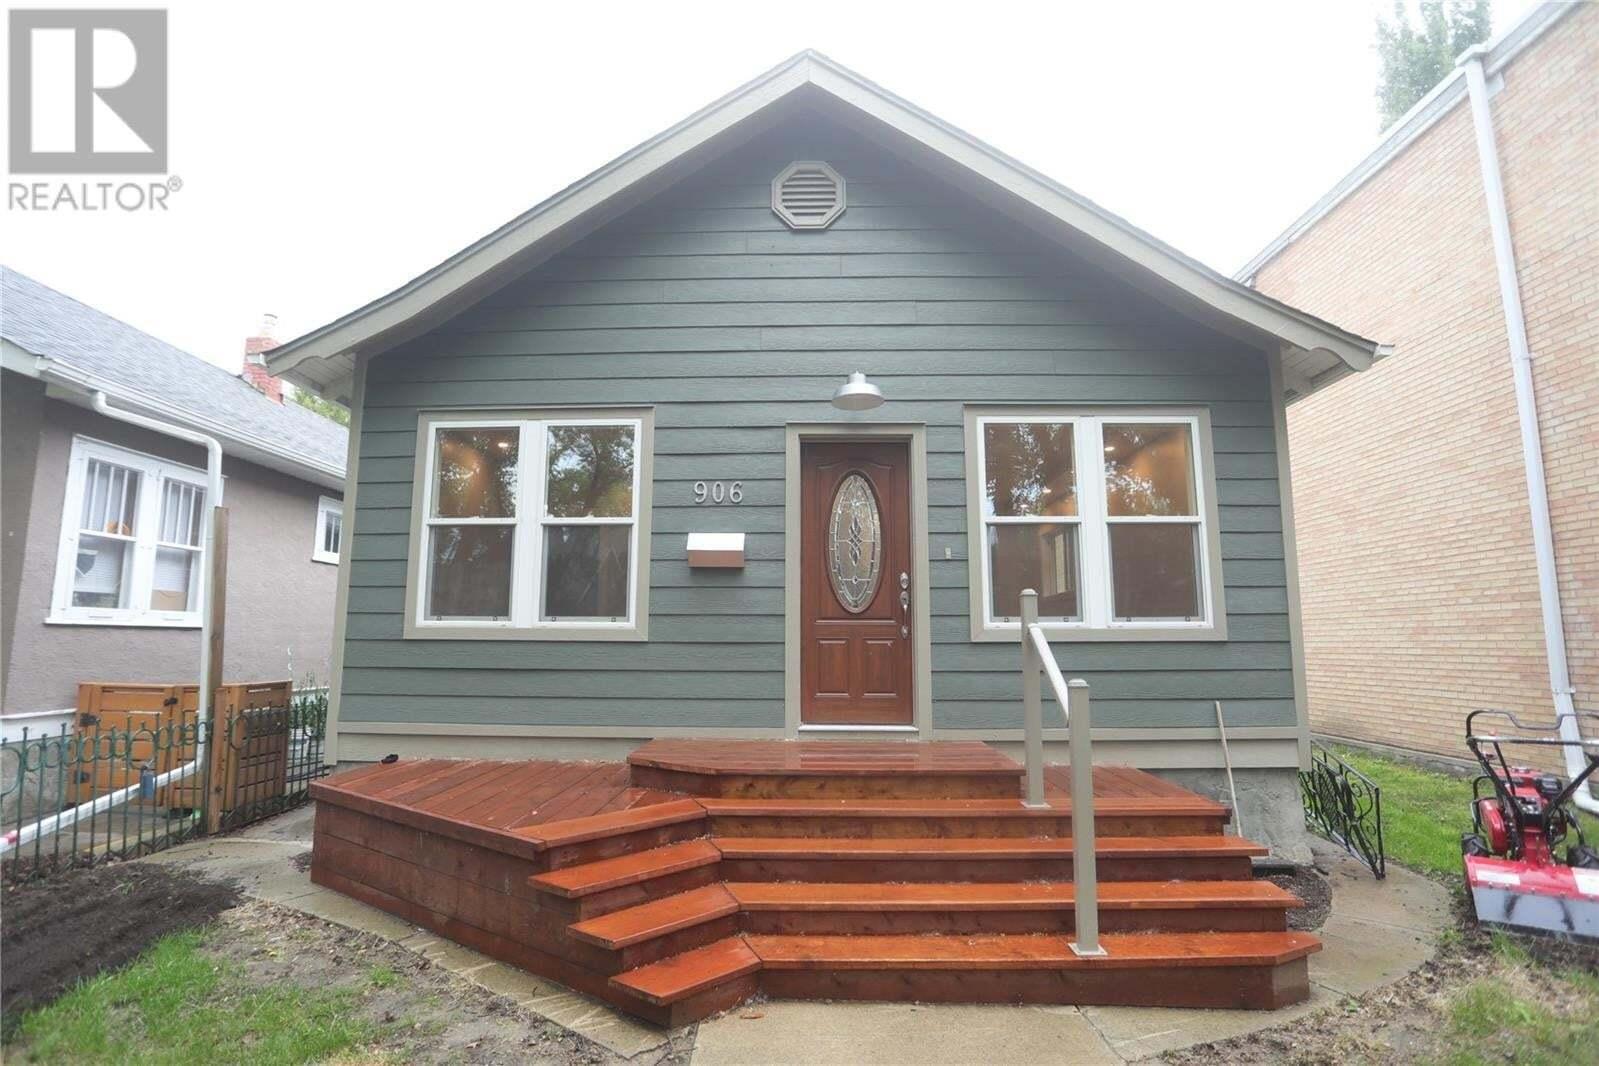 House for sale at 906 6th Ave N Saskatoon Saskatchewan - MLS: SK818577